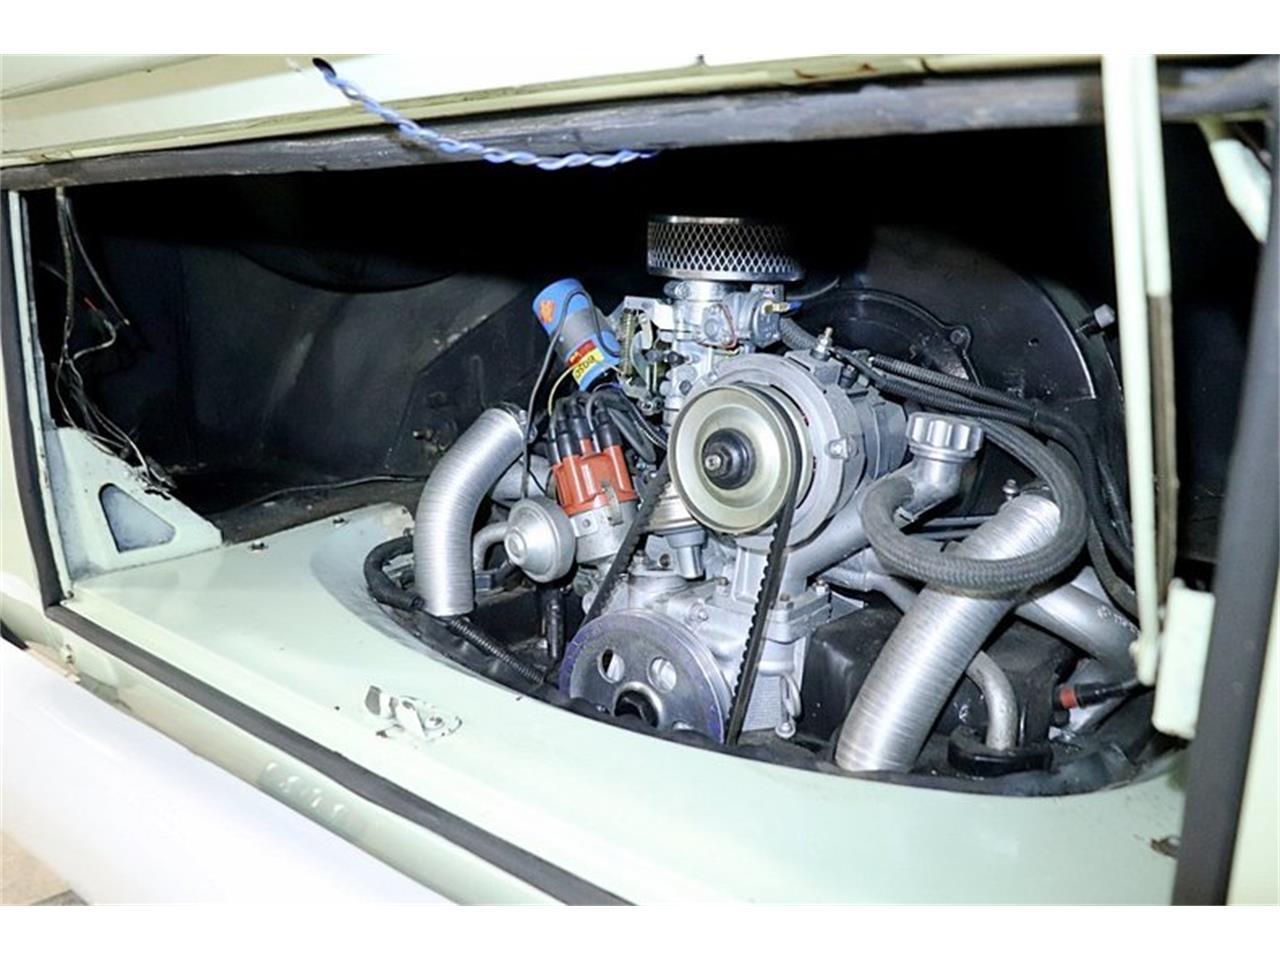 Large Picture of Classic '69 Volkswagen Westfalia Camper - $26,900.00 - Q5WZ